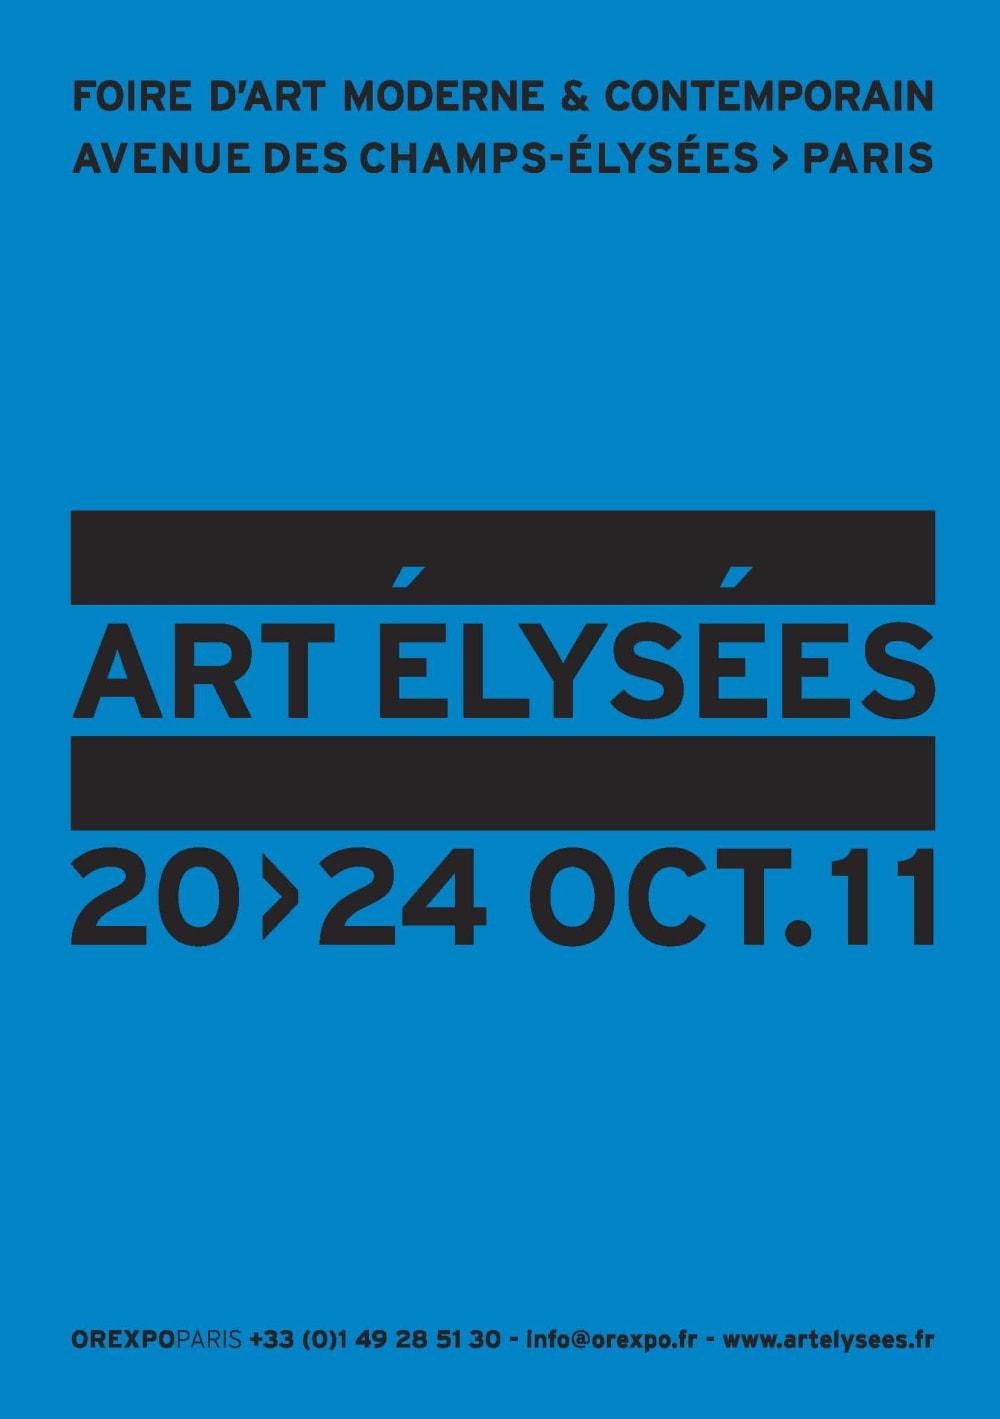 ART ELYSEES 2011